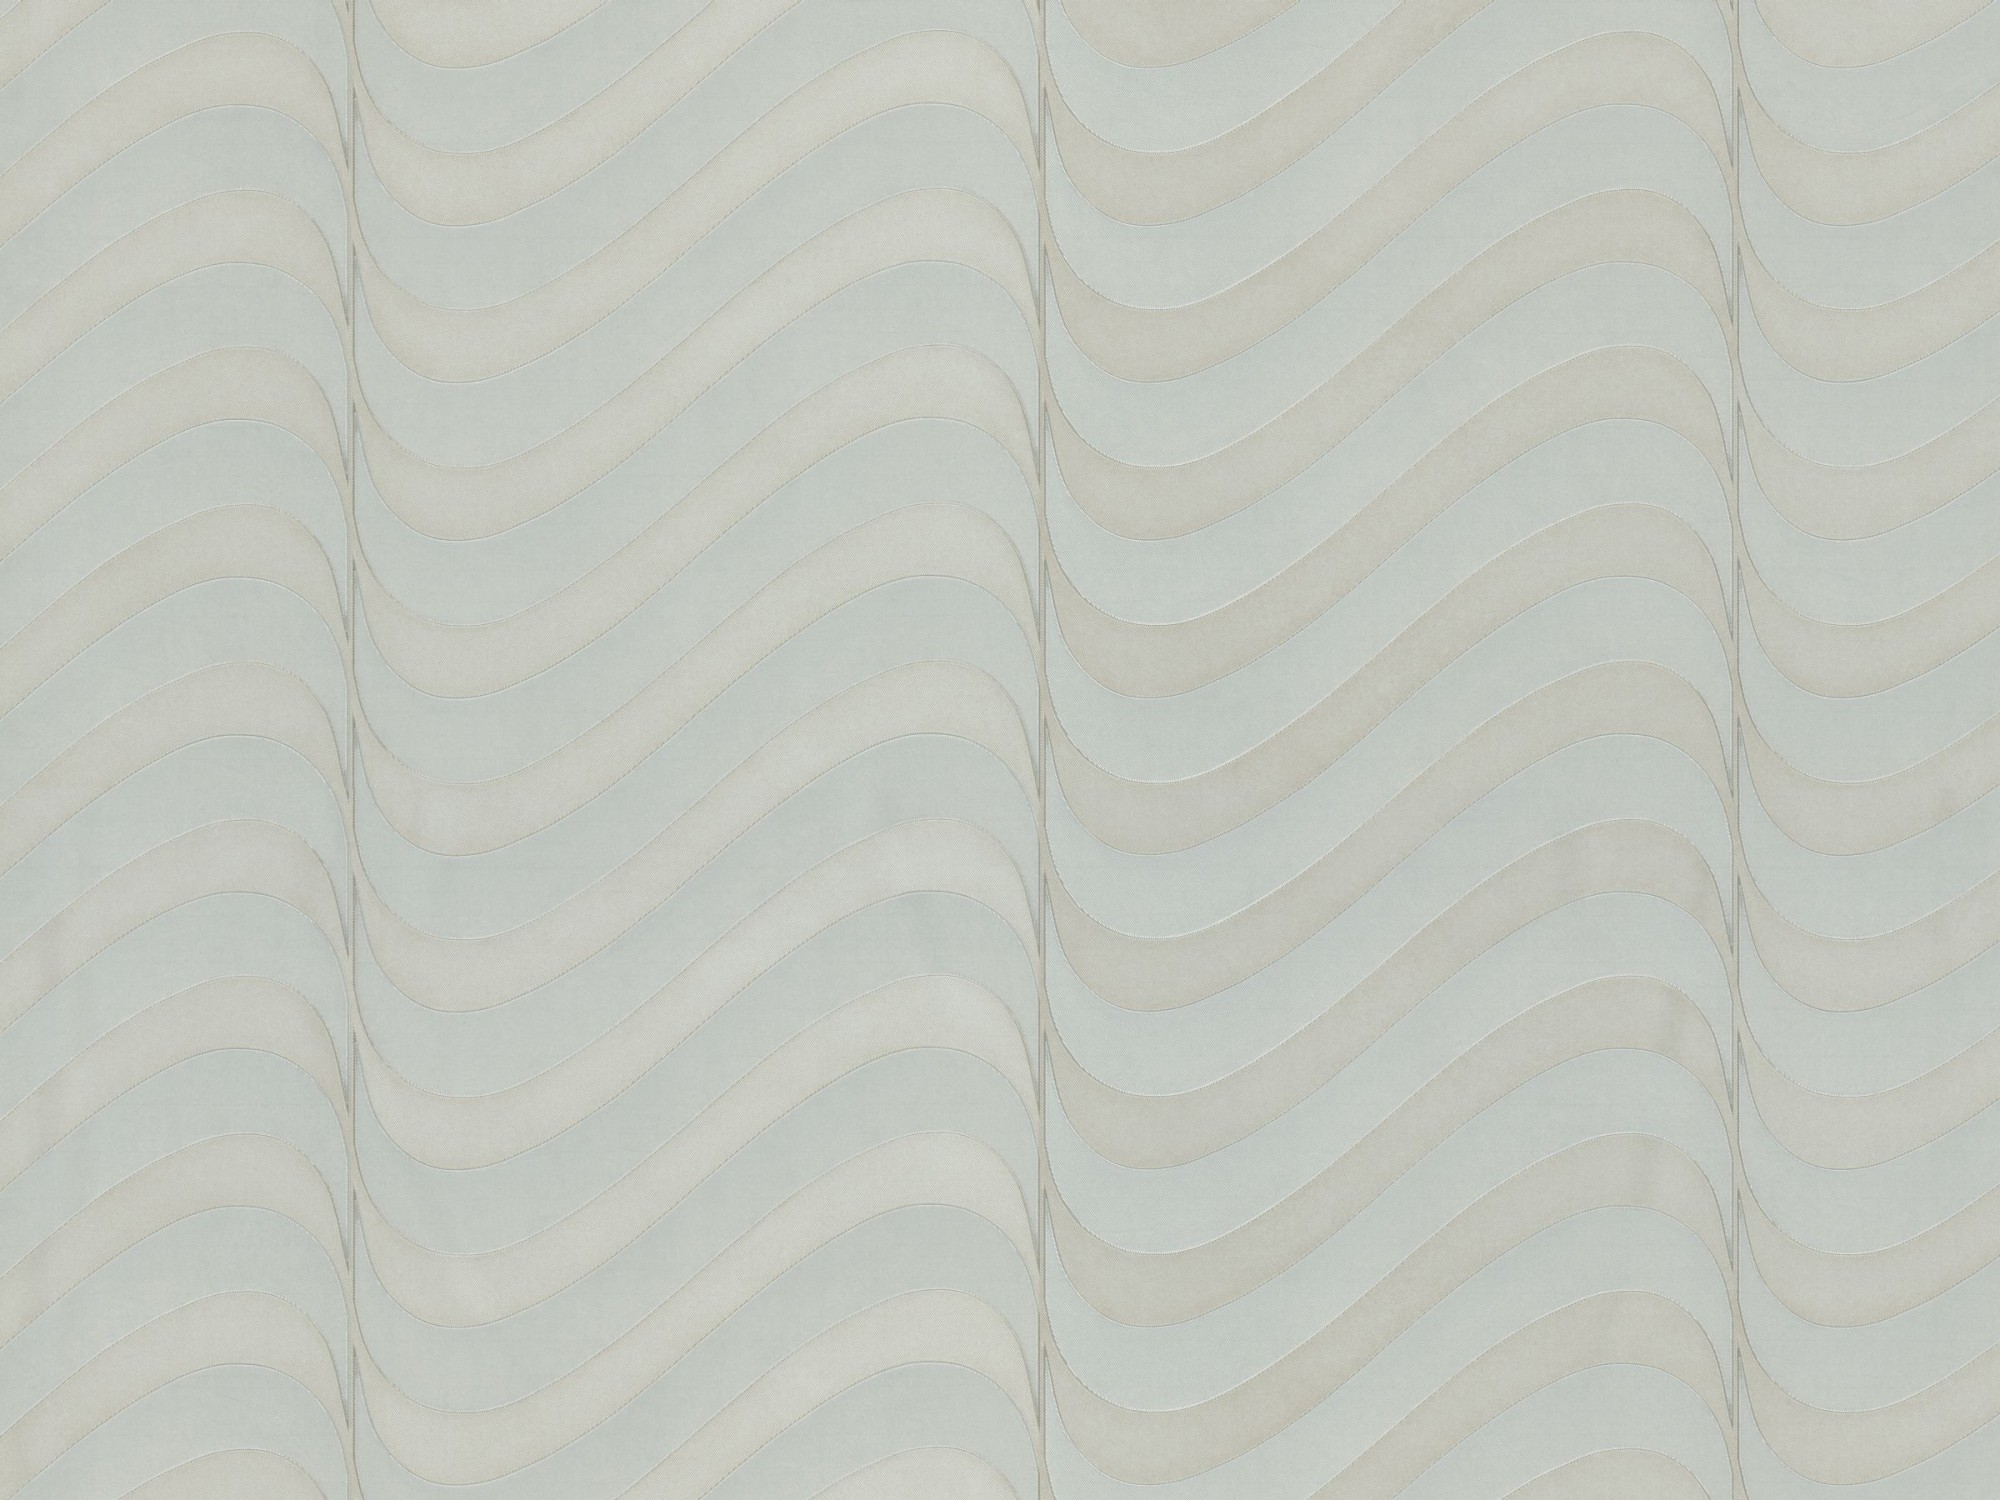 Tapete vlies grafisch silber grau marburg opulence 56001 for Tapete silber grau